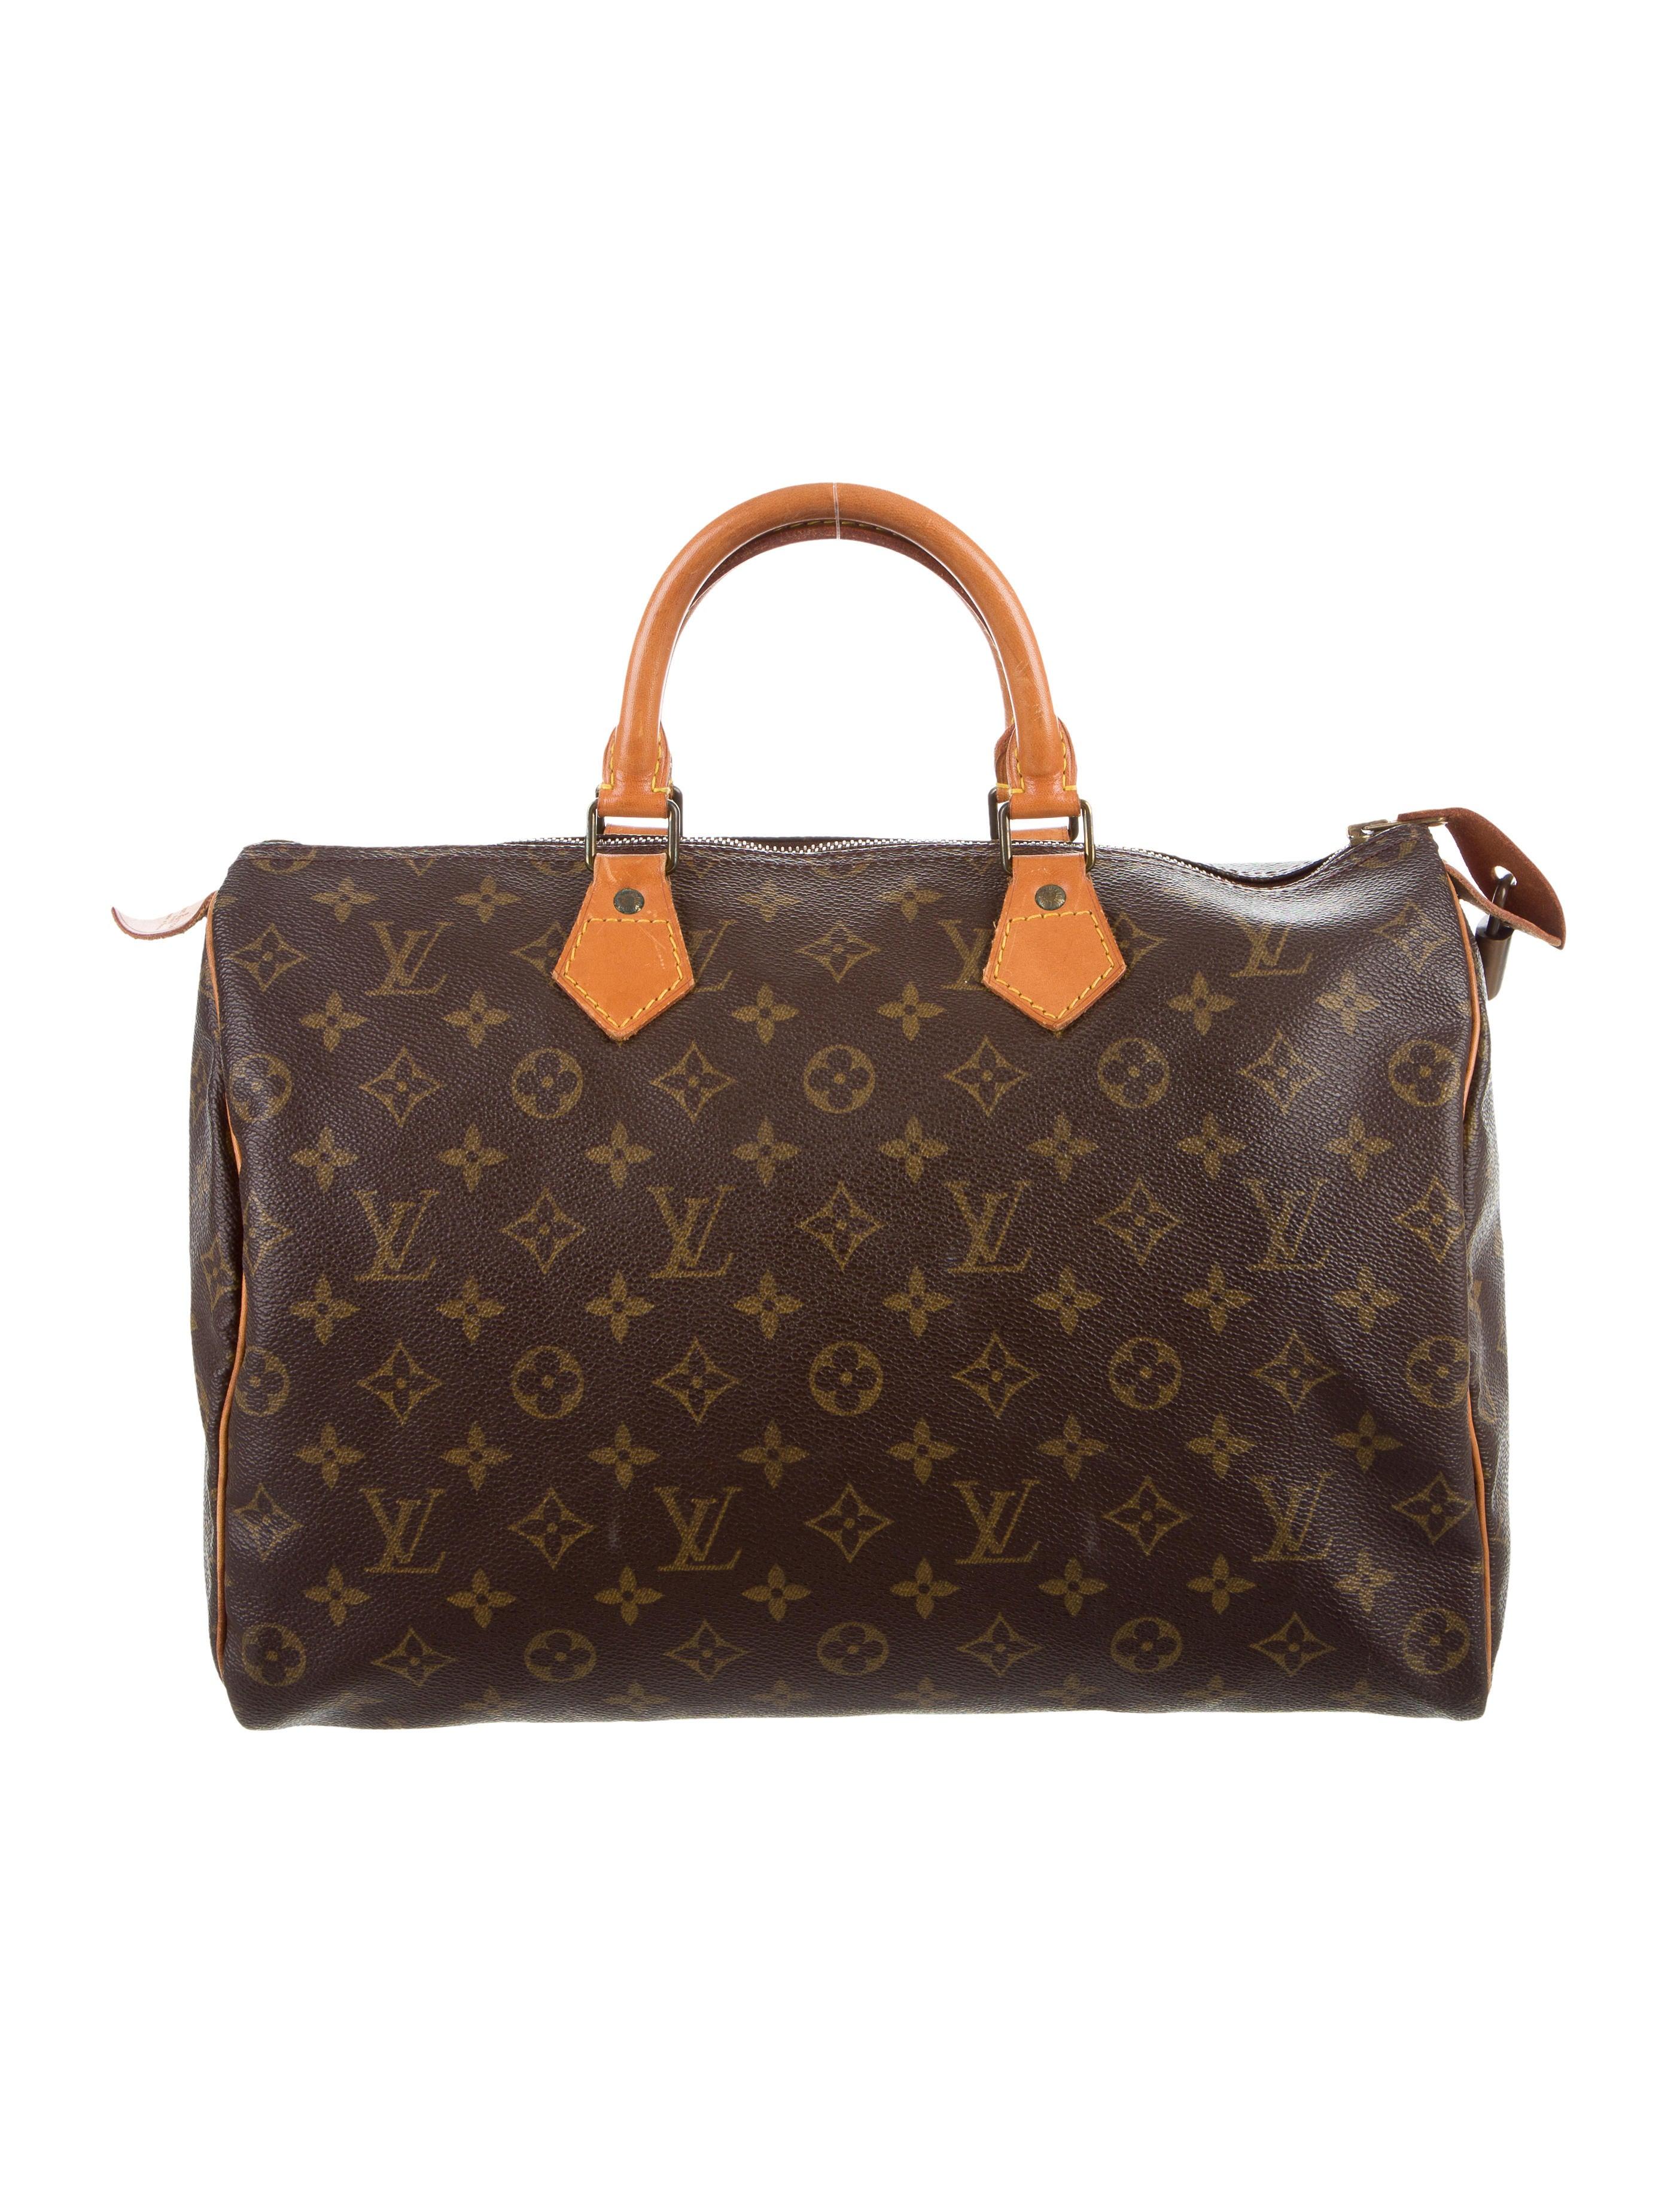 louis vuitton monogram speedy 35 handbags lou118757. Black Bedroom Furniture Sets. Home Design Ideas